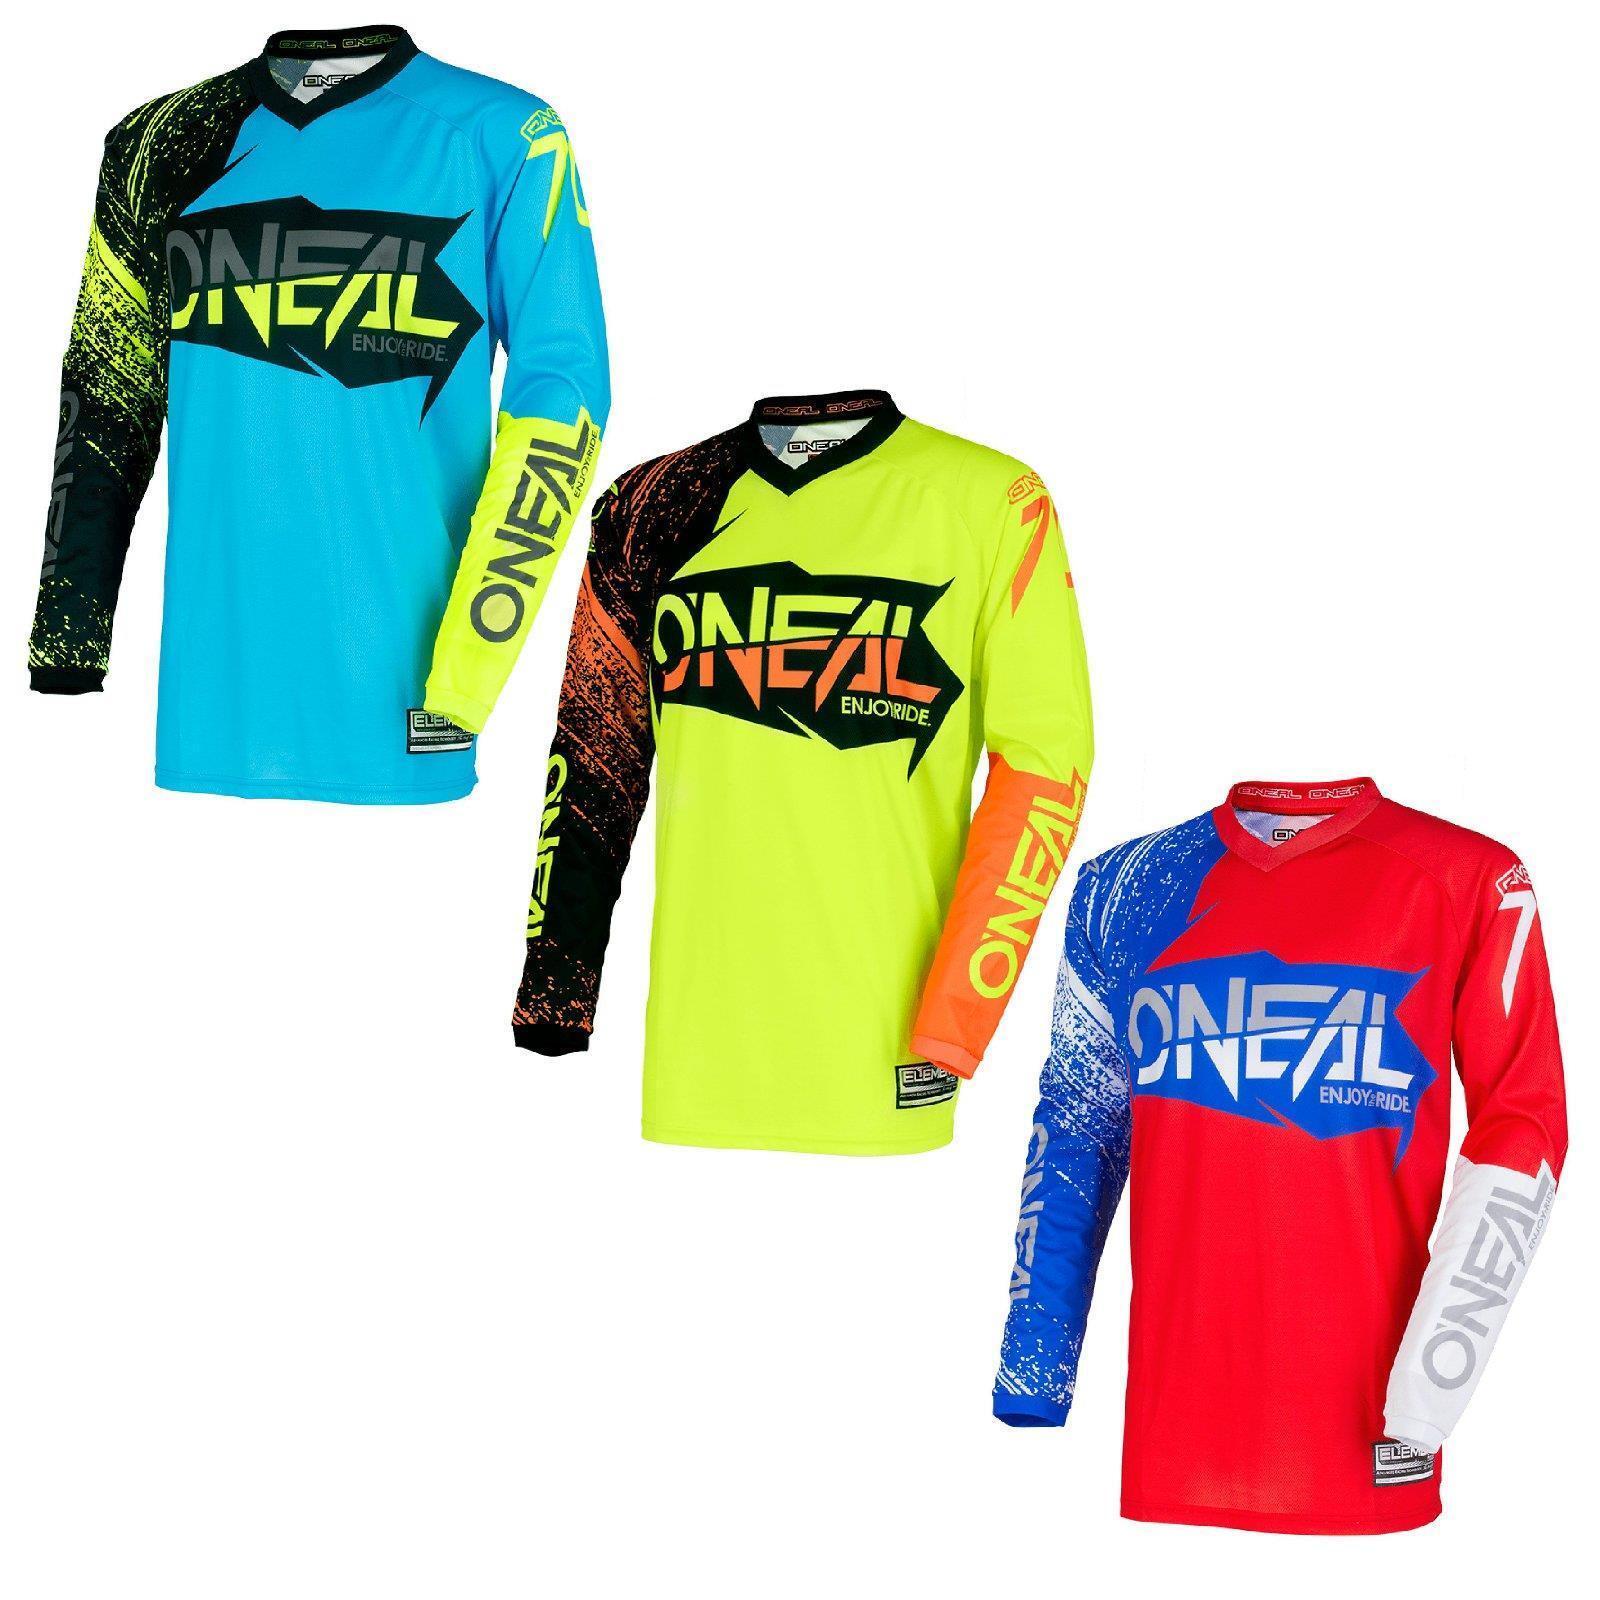 ONeal Element Burnout Moto Cross Jersey Shirt Enduro Downhill lMountainbike MTB